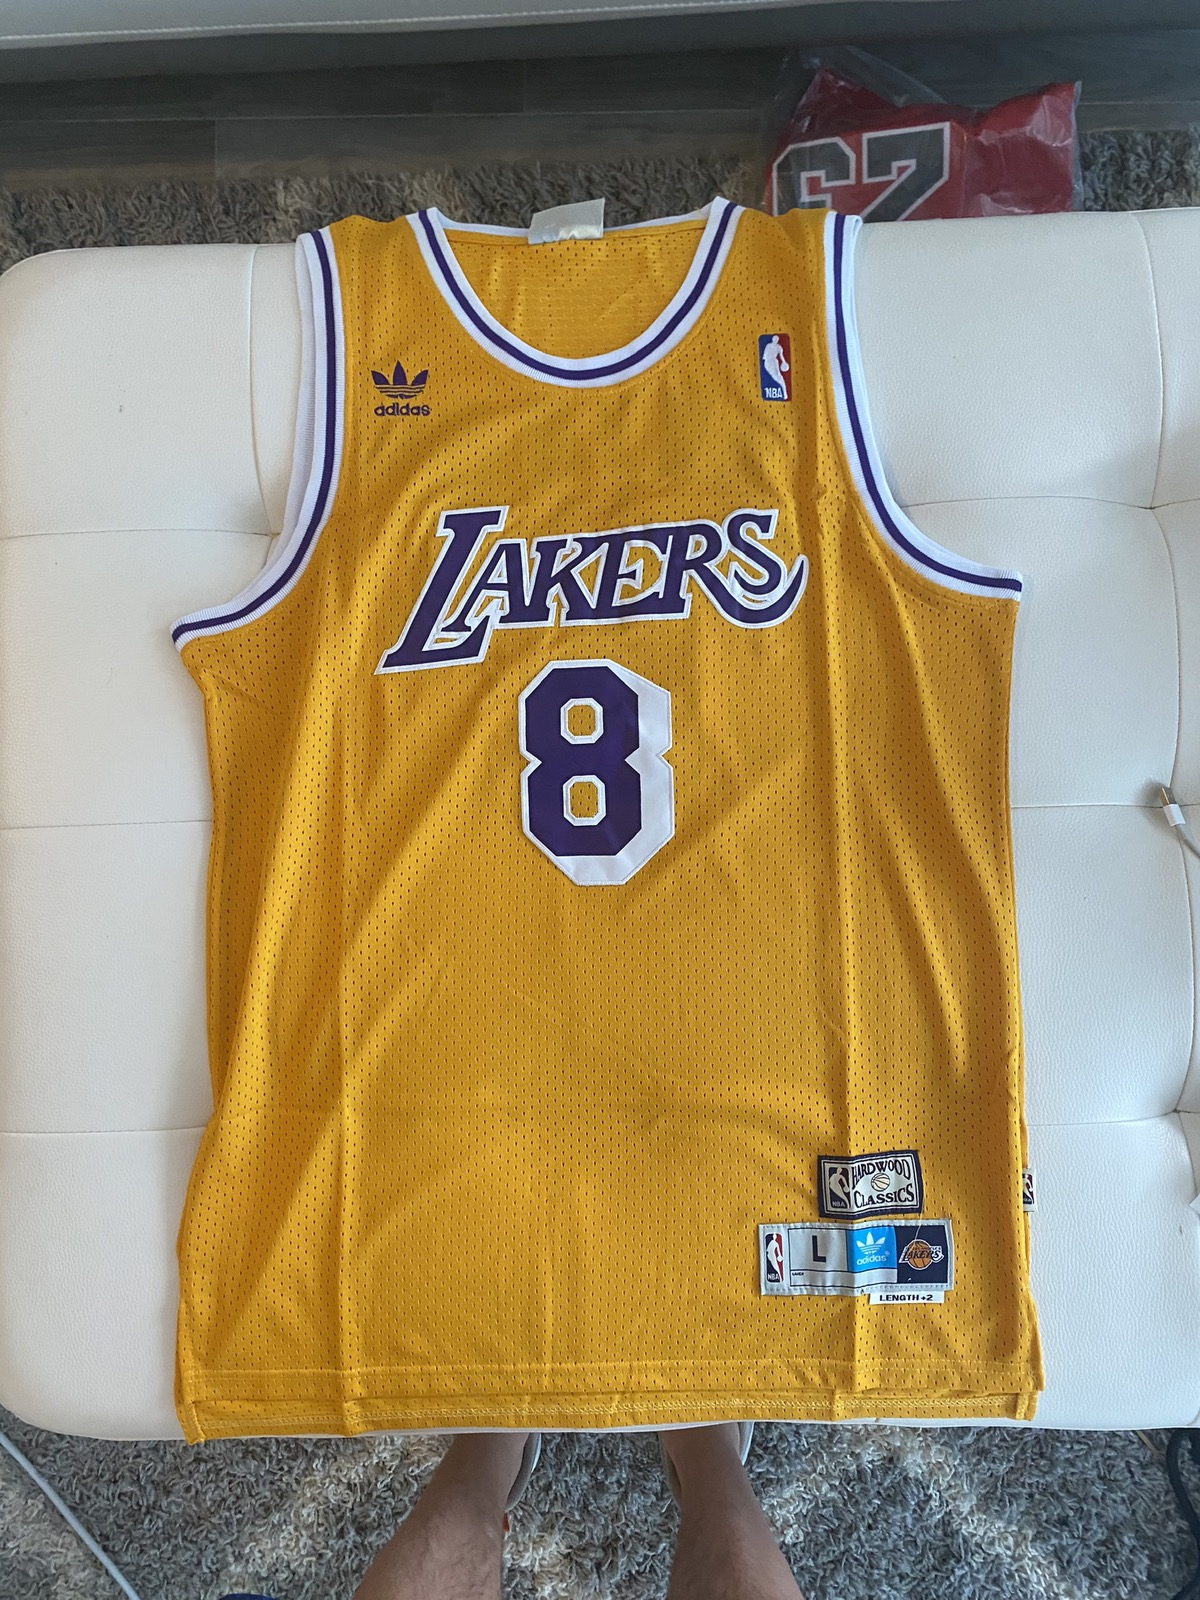 Adidas Kobe Bryant Gold Lakers Throwback Jersey